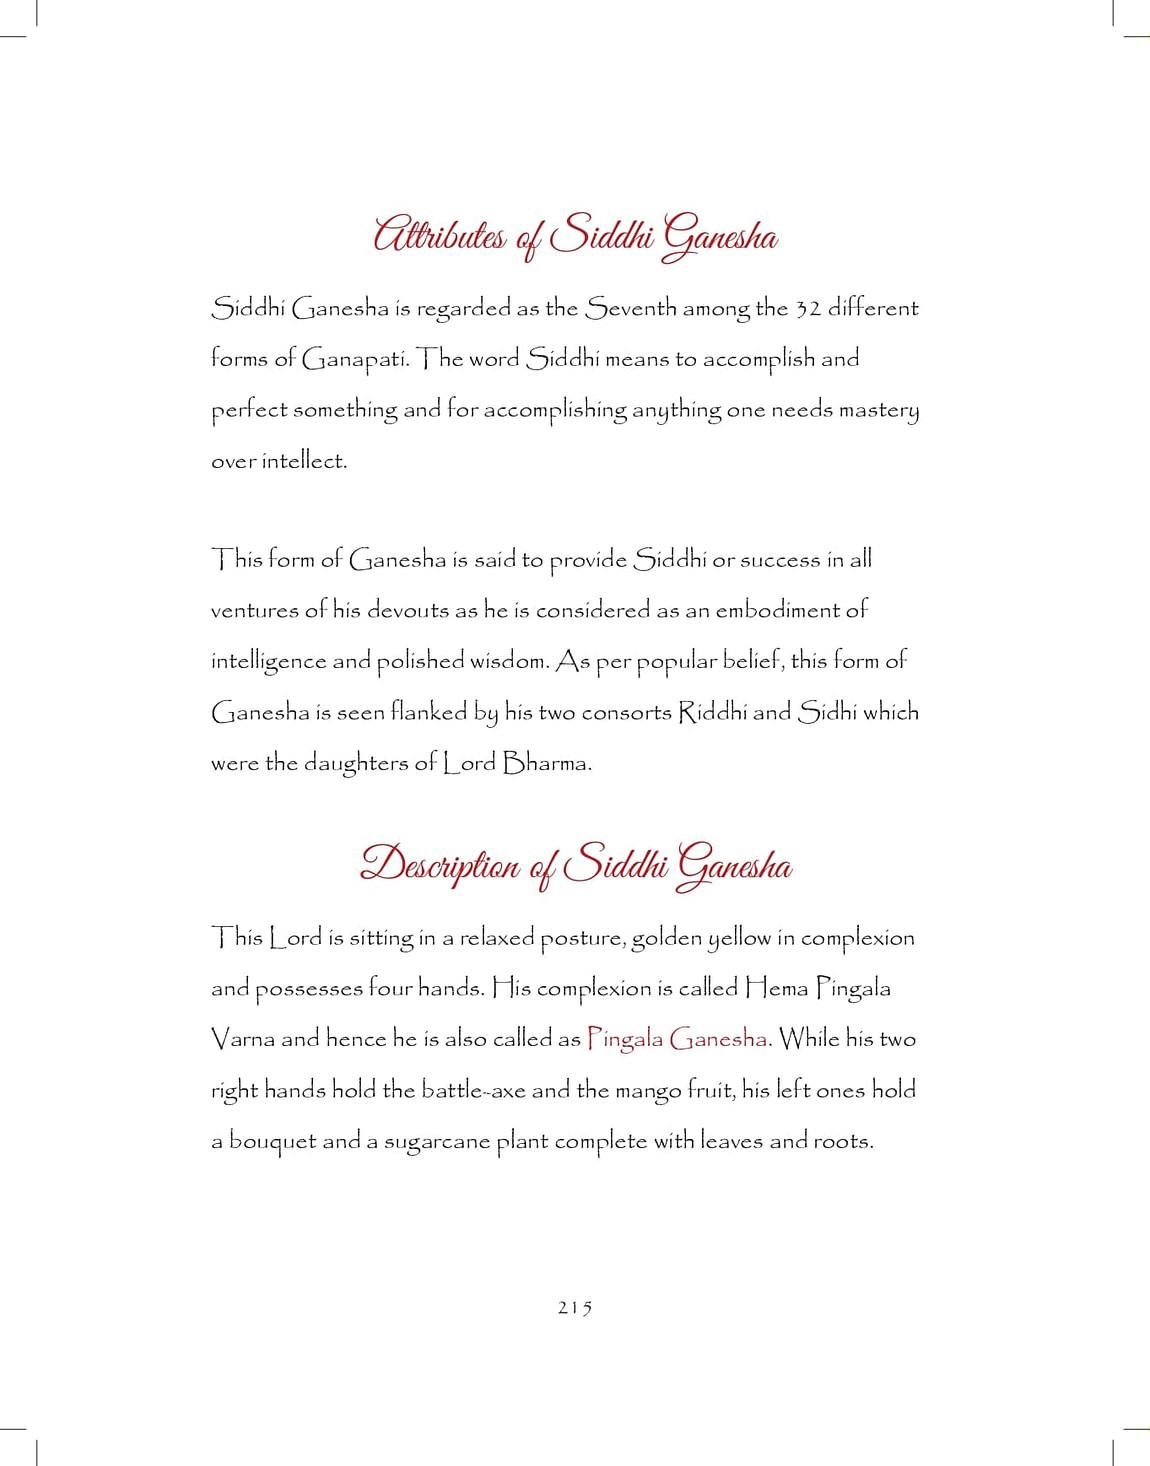 Ganesh-print_pages-to-jpg-0215.jpg